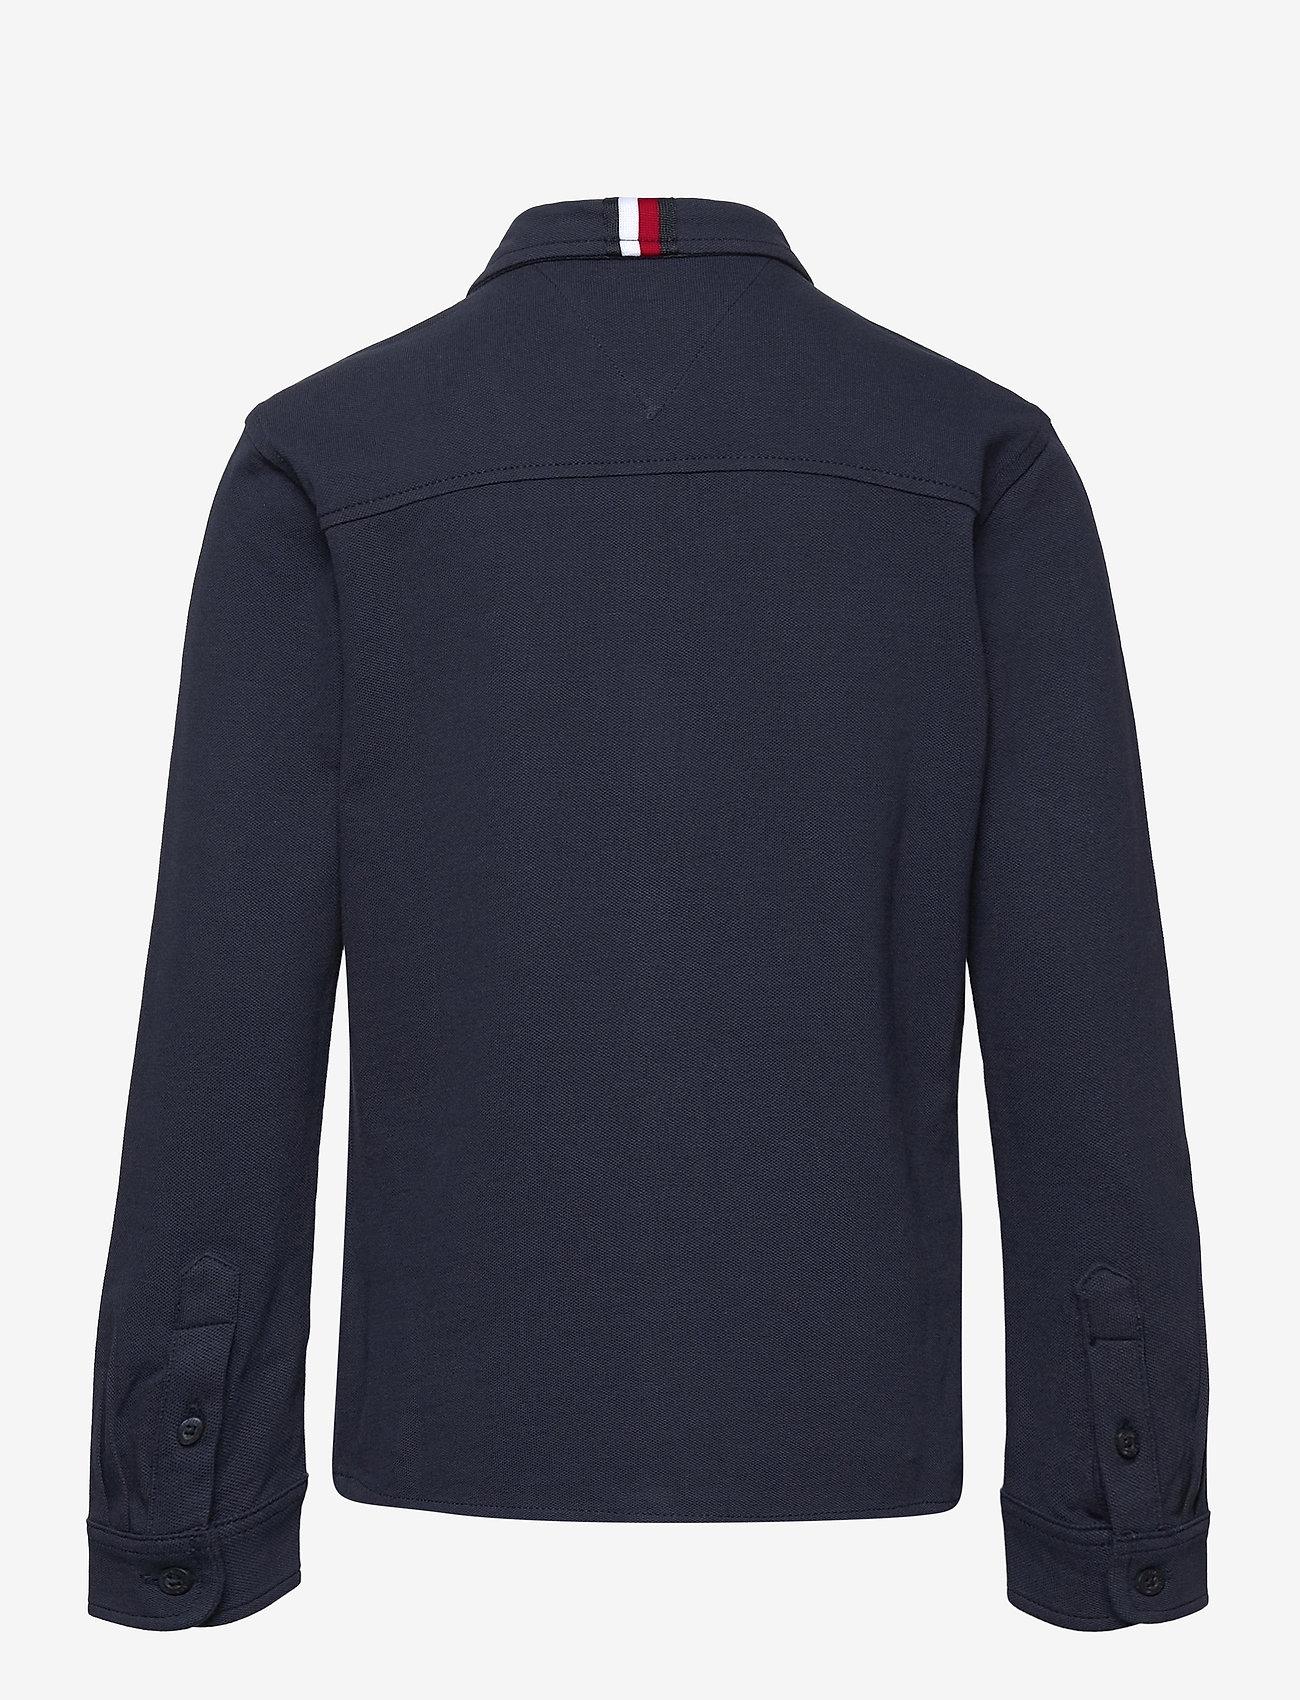 Tommy Hilfiger - STRETCH PIQUE SHIRT L/S - shirts - twilight navy - 1